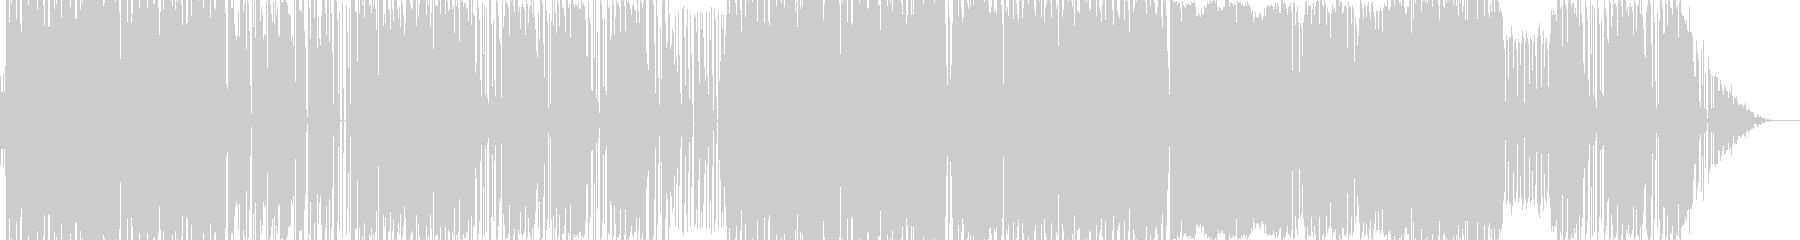 kawaii Future Bass の未再生の波形